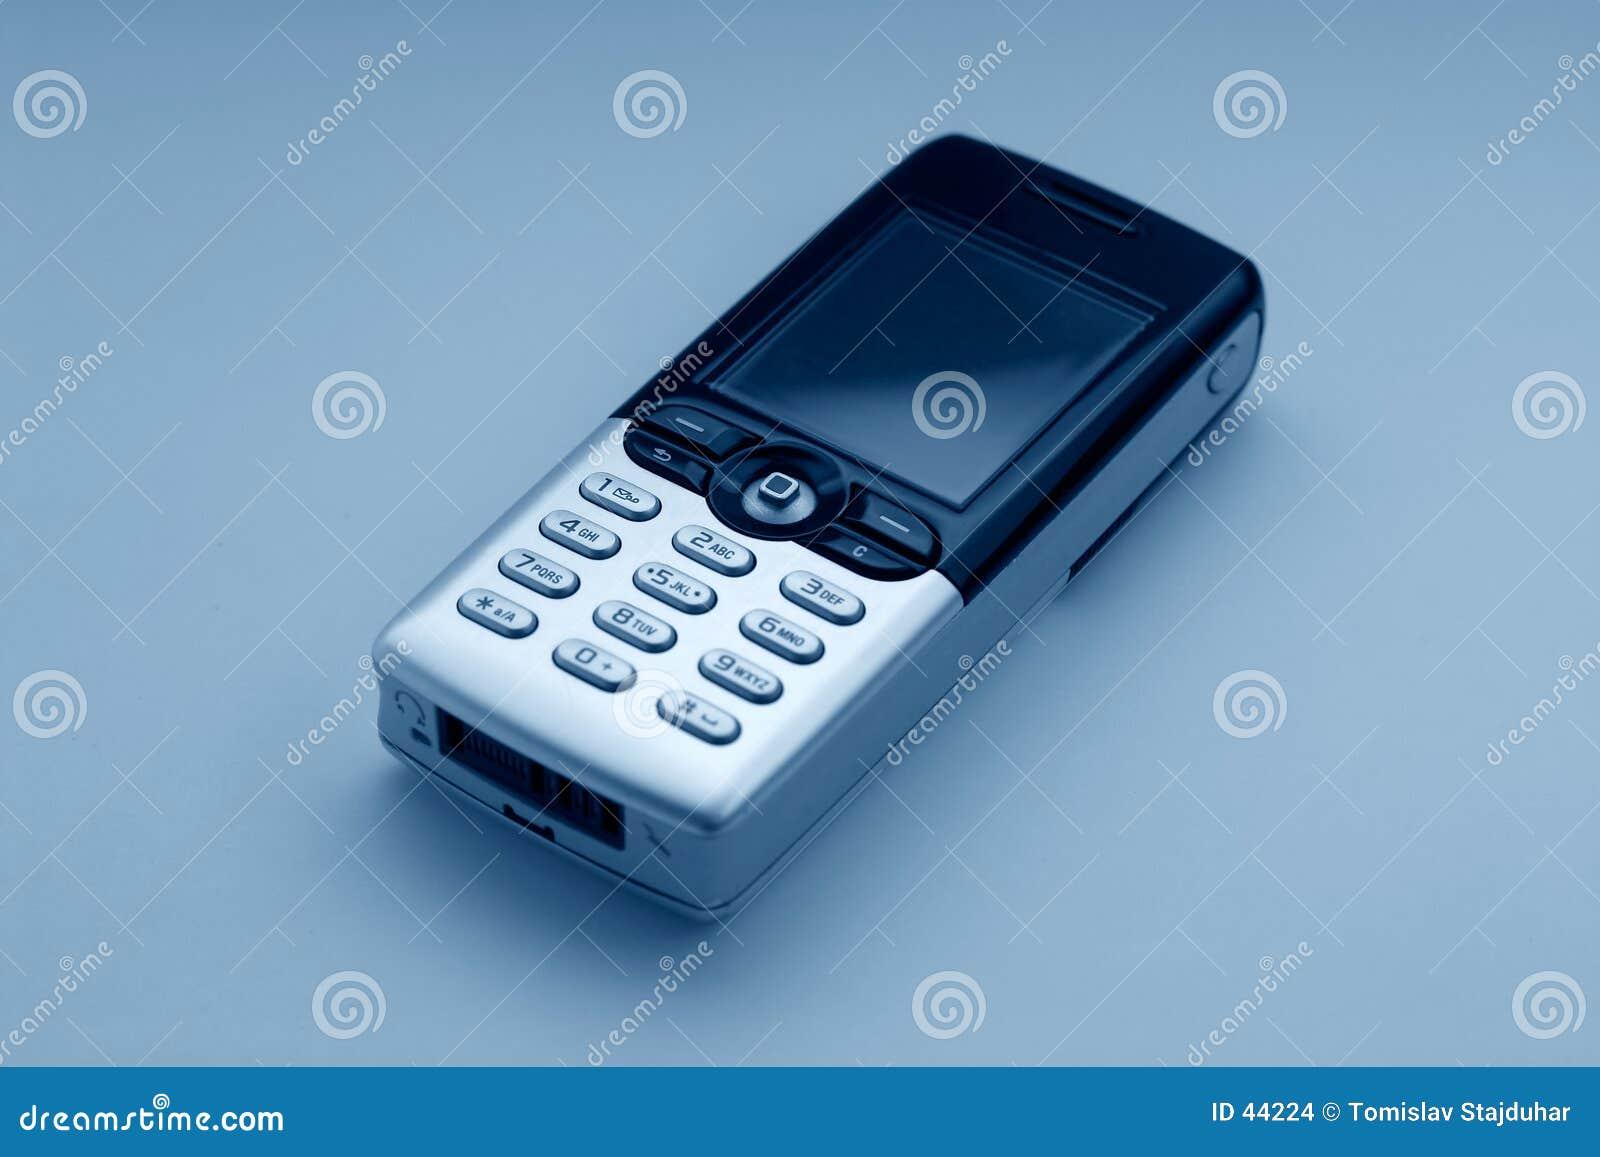 Téléphone portable - son bleu